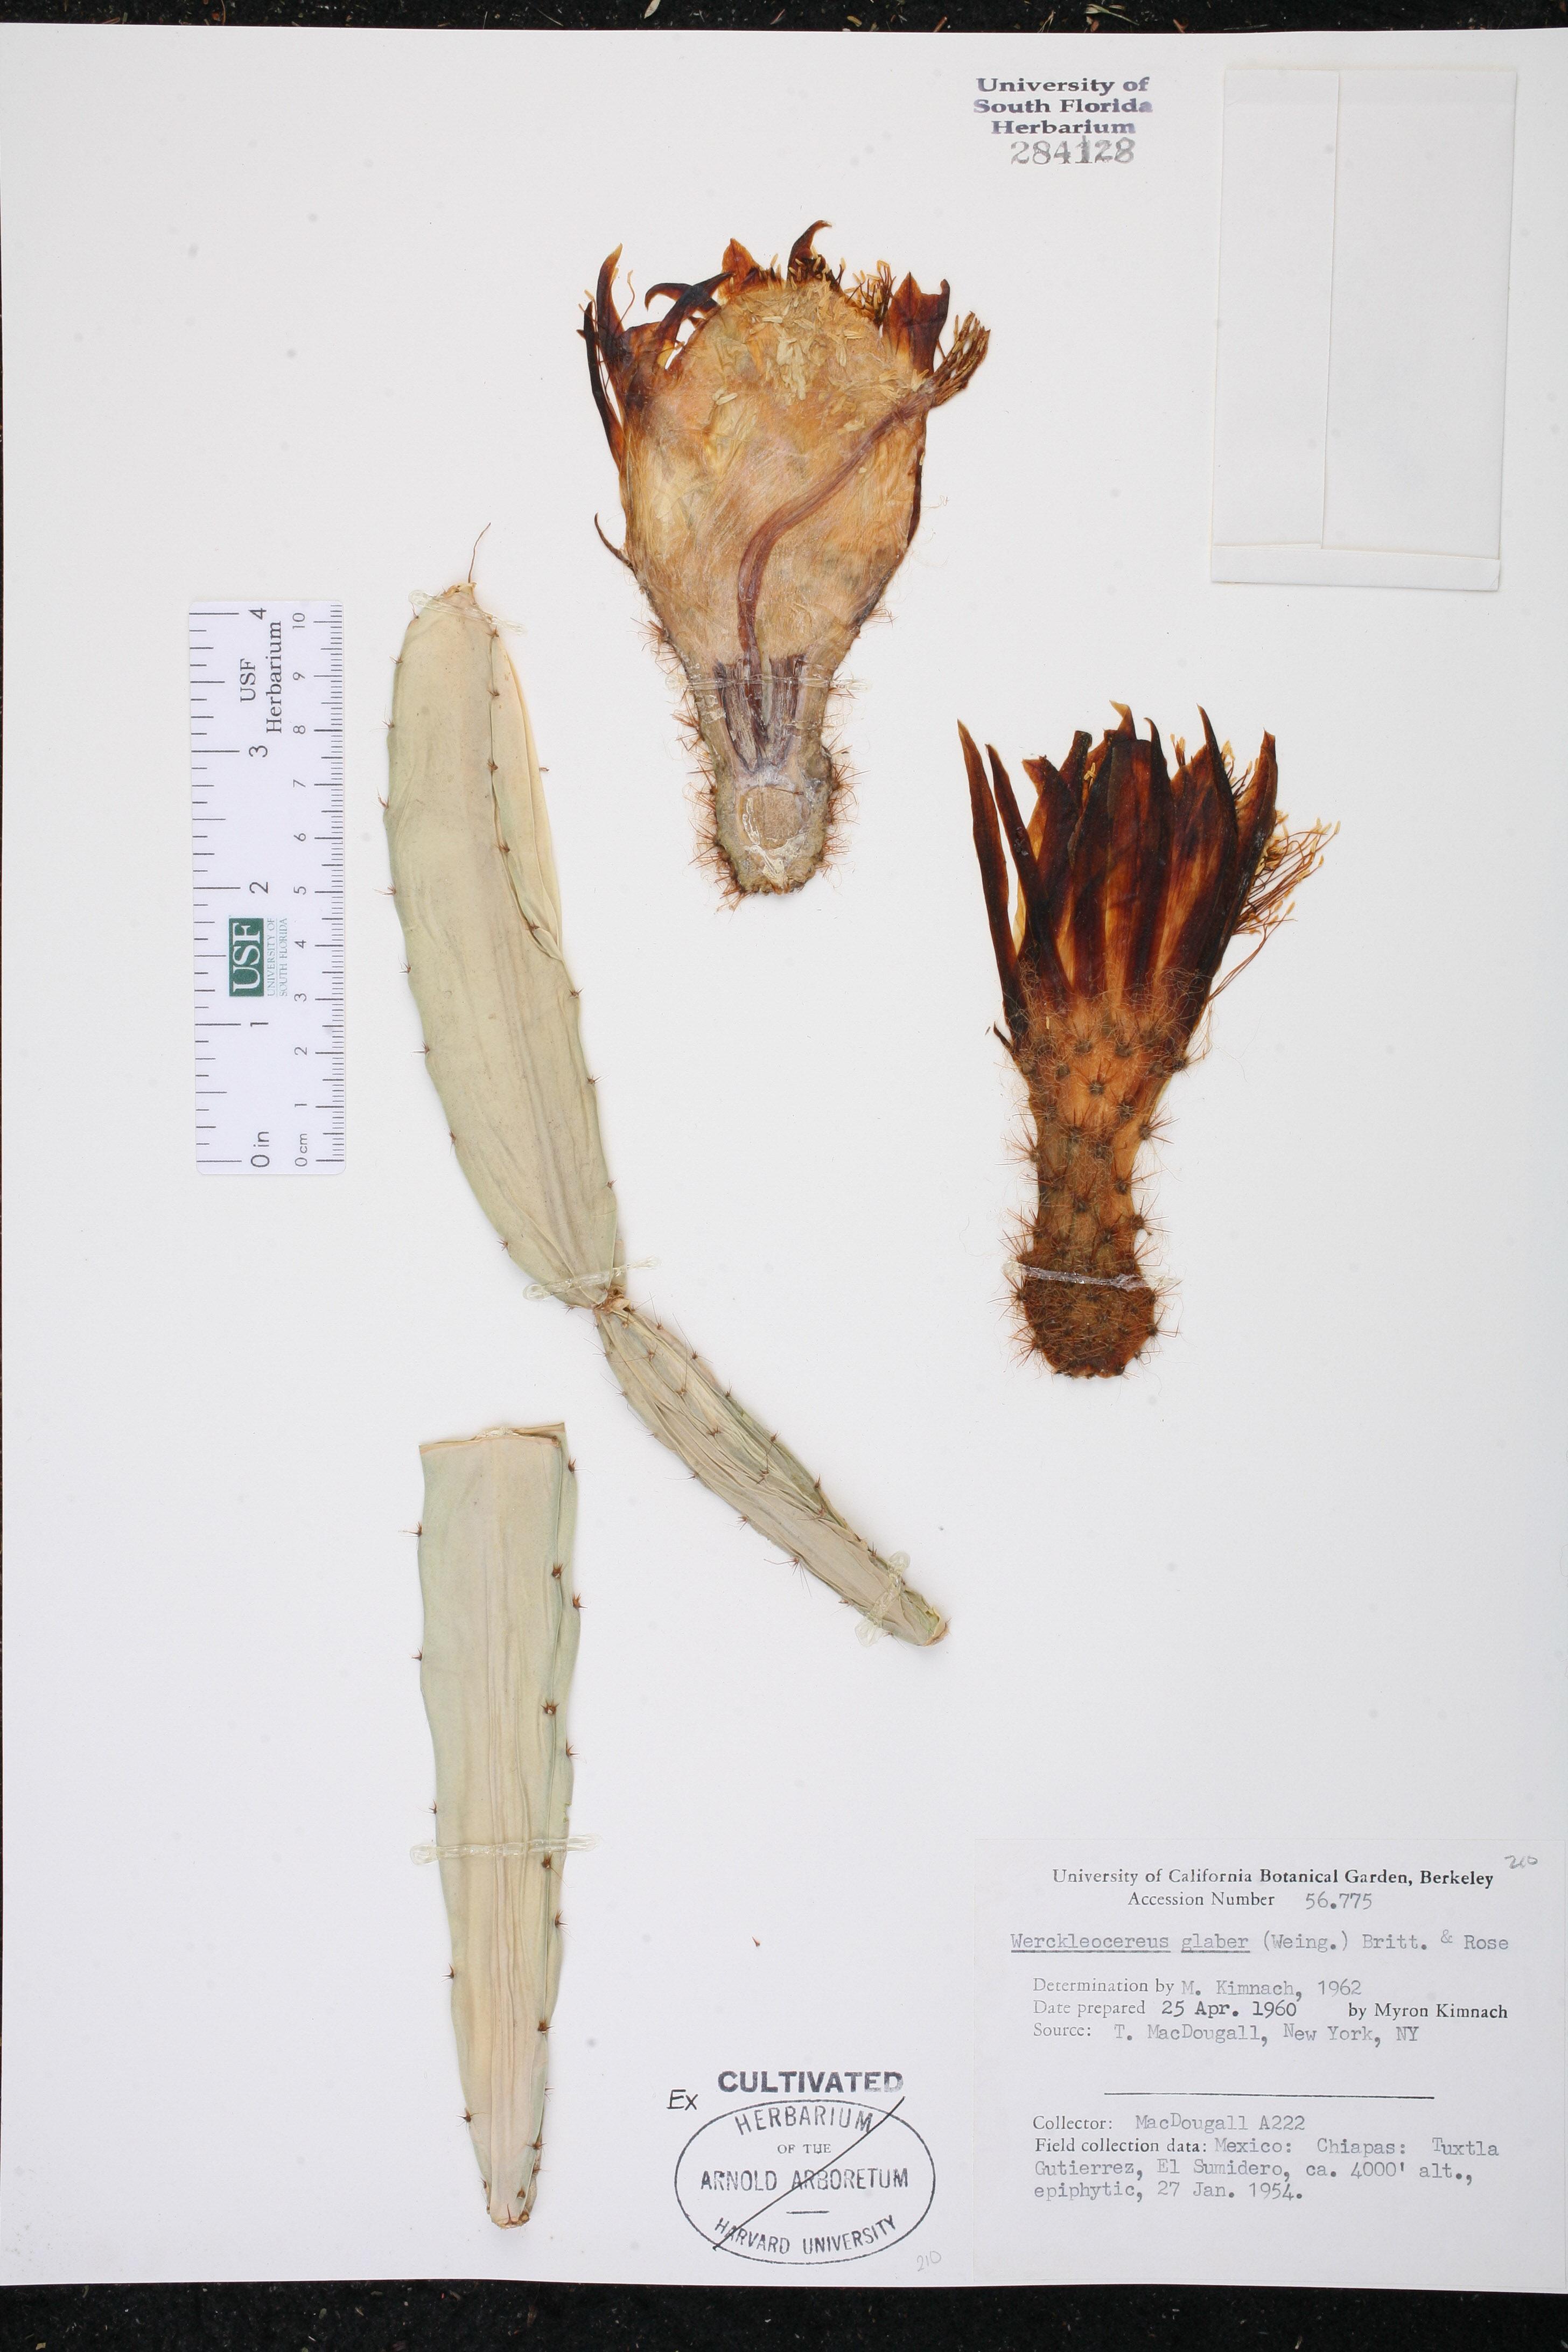 Weberocereus glaber image